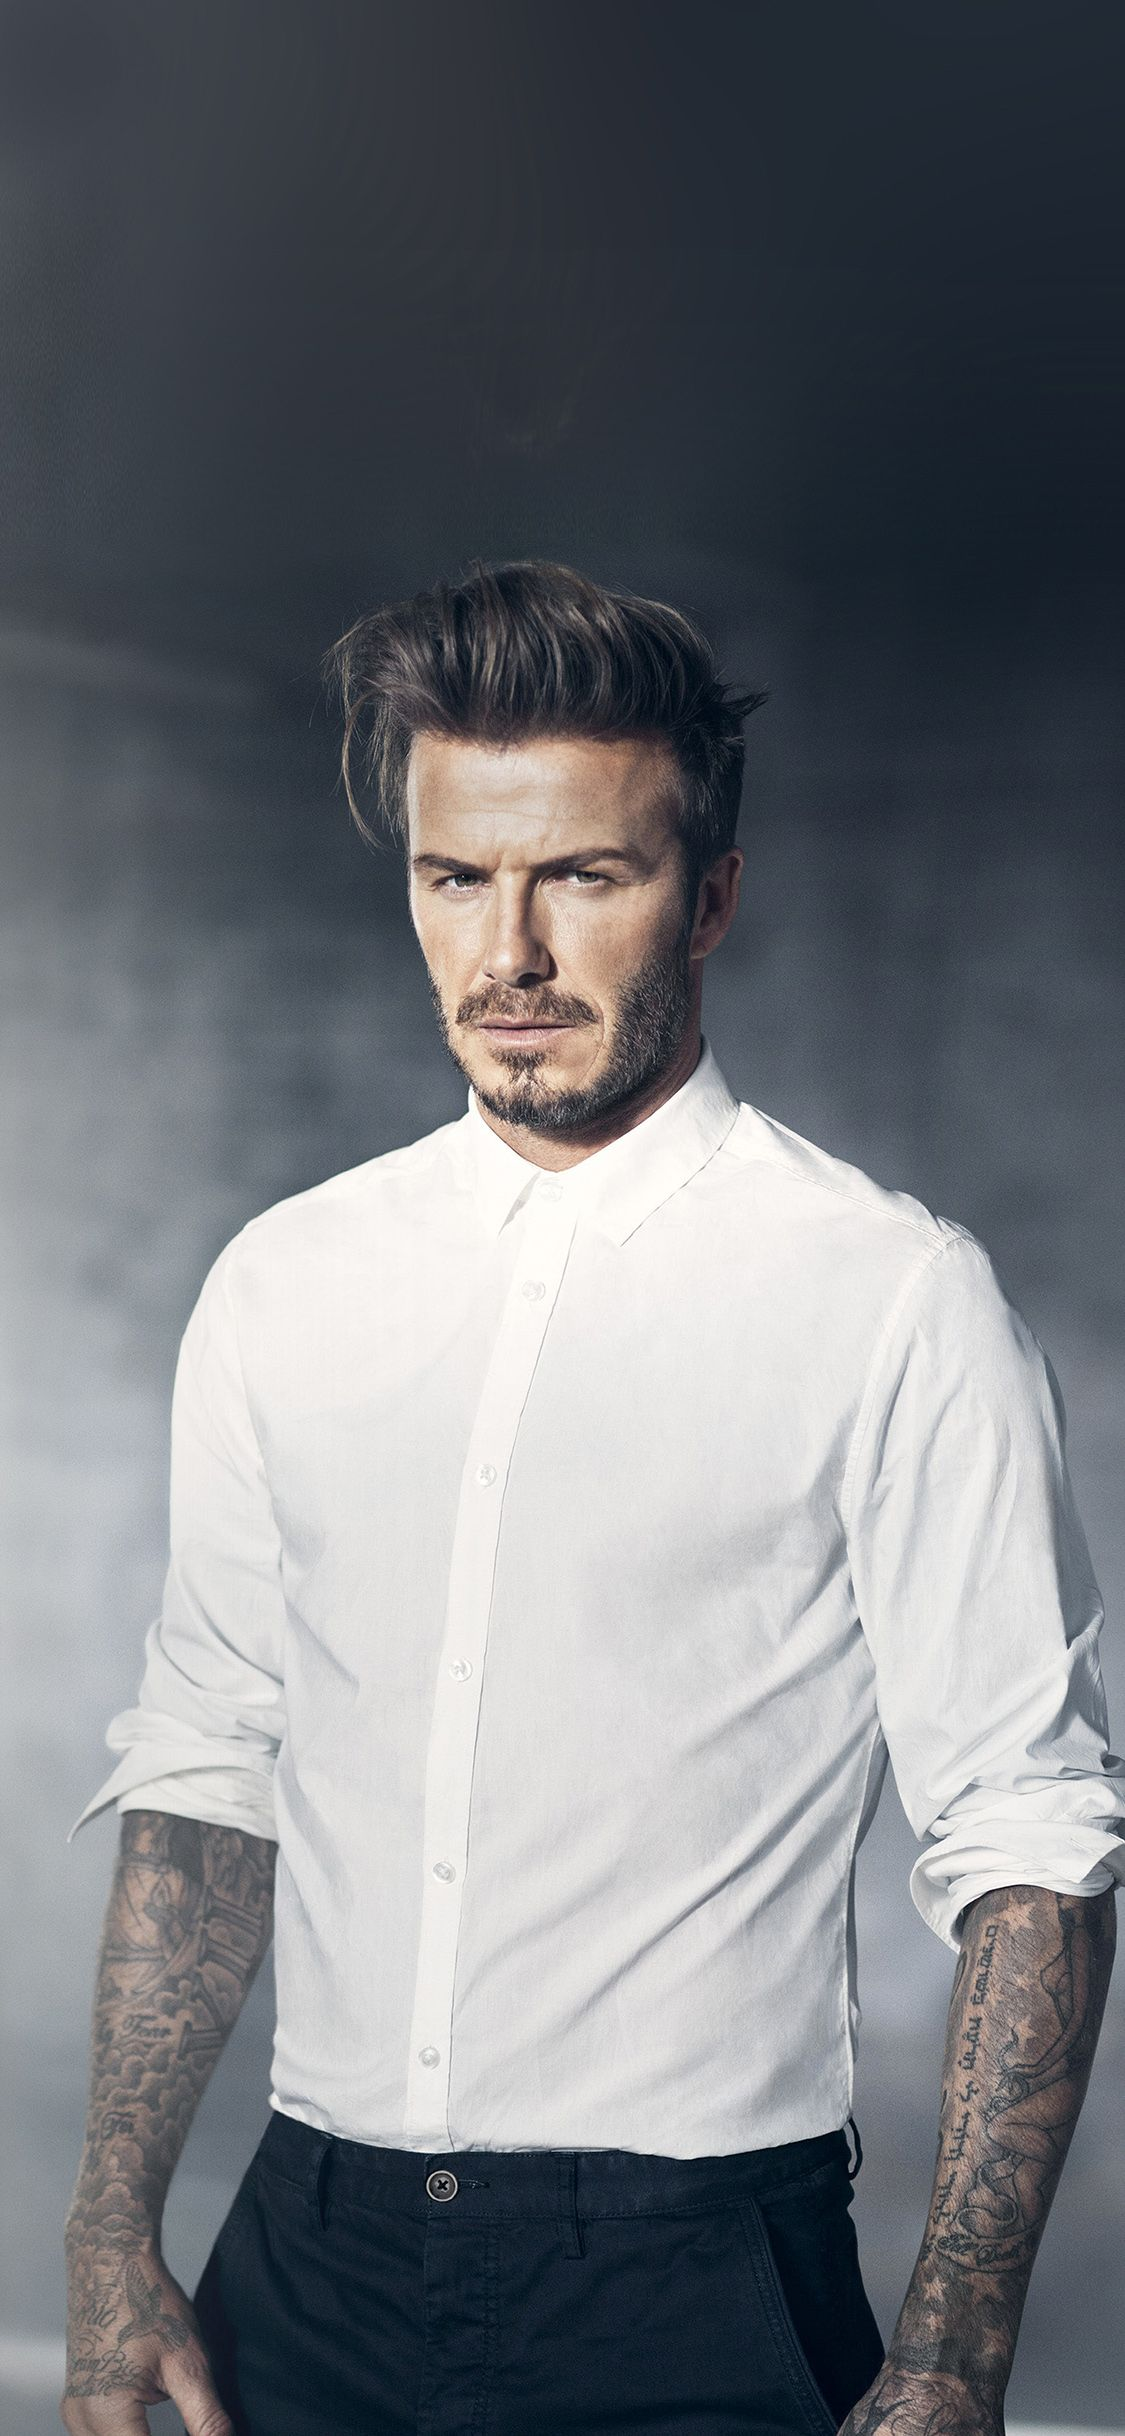 ef25862b2 David beckham model iPhone X wallpaper | David Beckham in 2019 ...